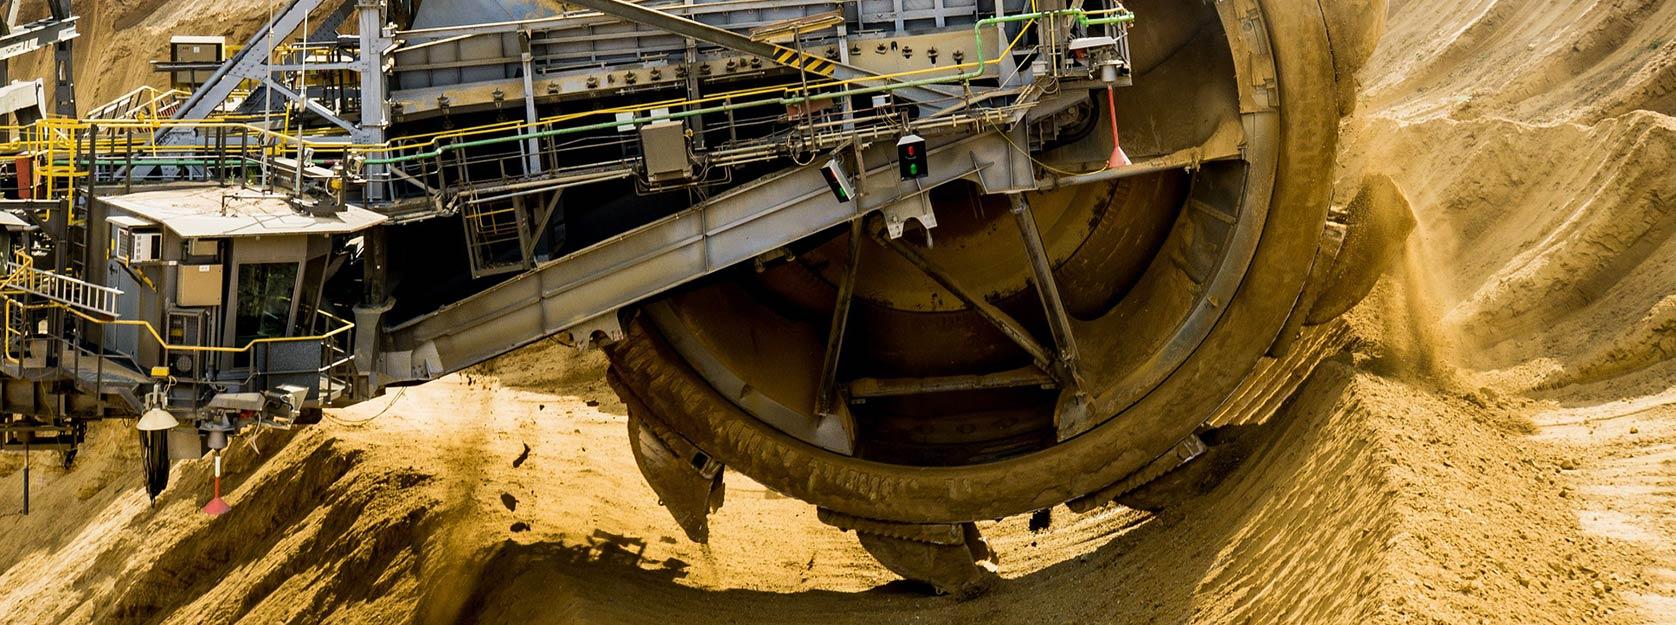 Paddle-wheel excavator